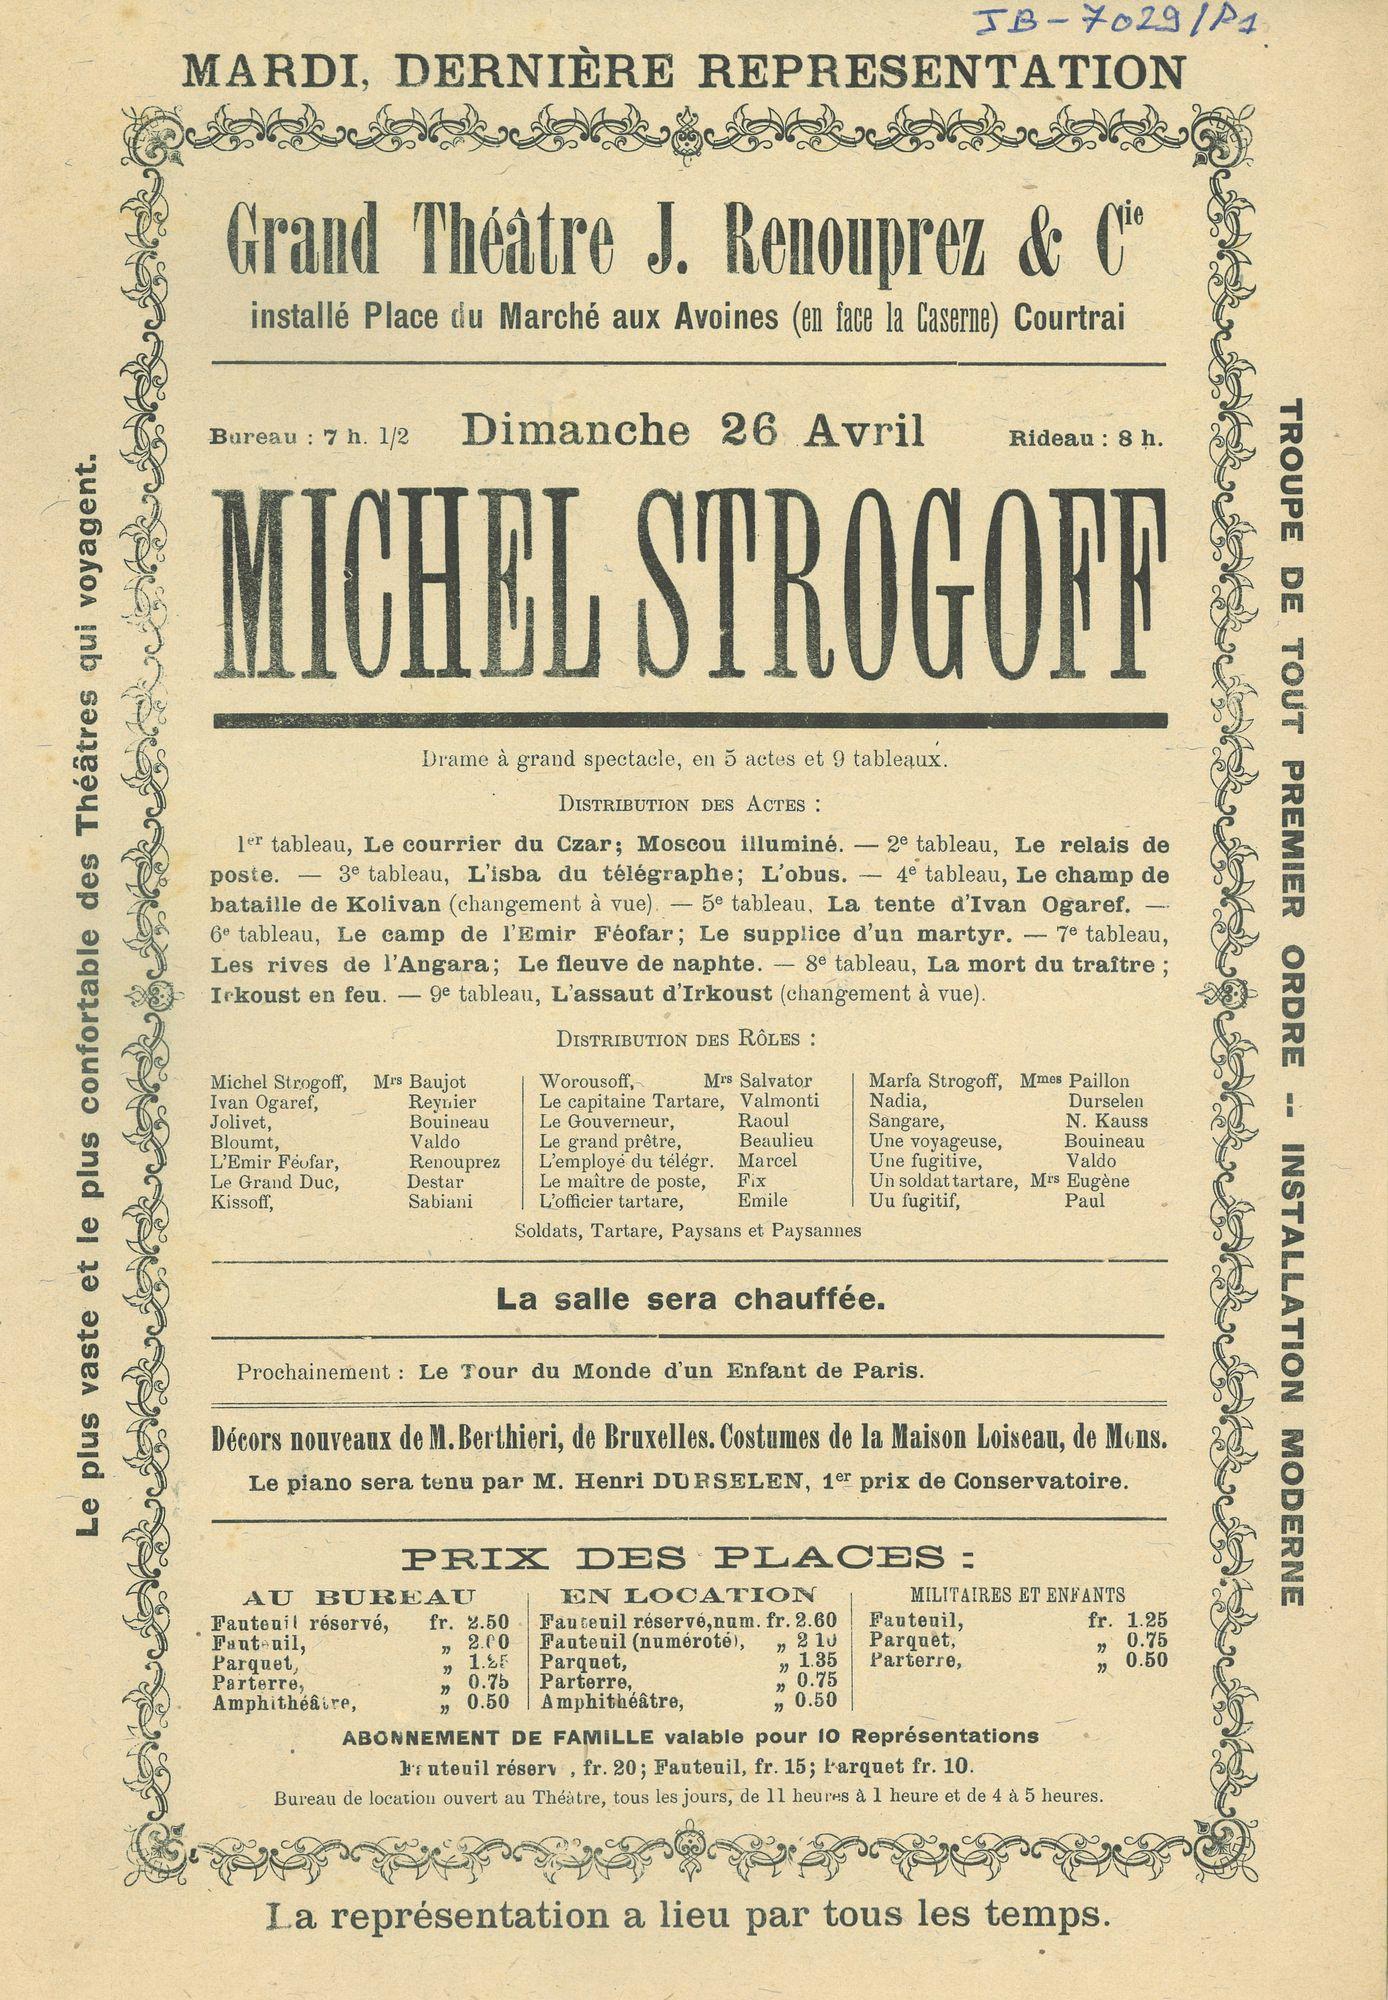 Paasfoor: Théatre J. Renouprez et Cie